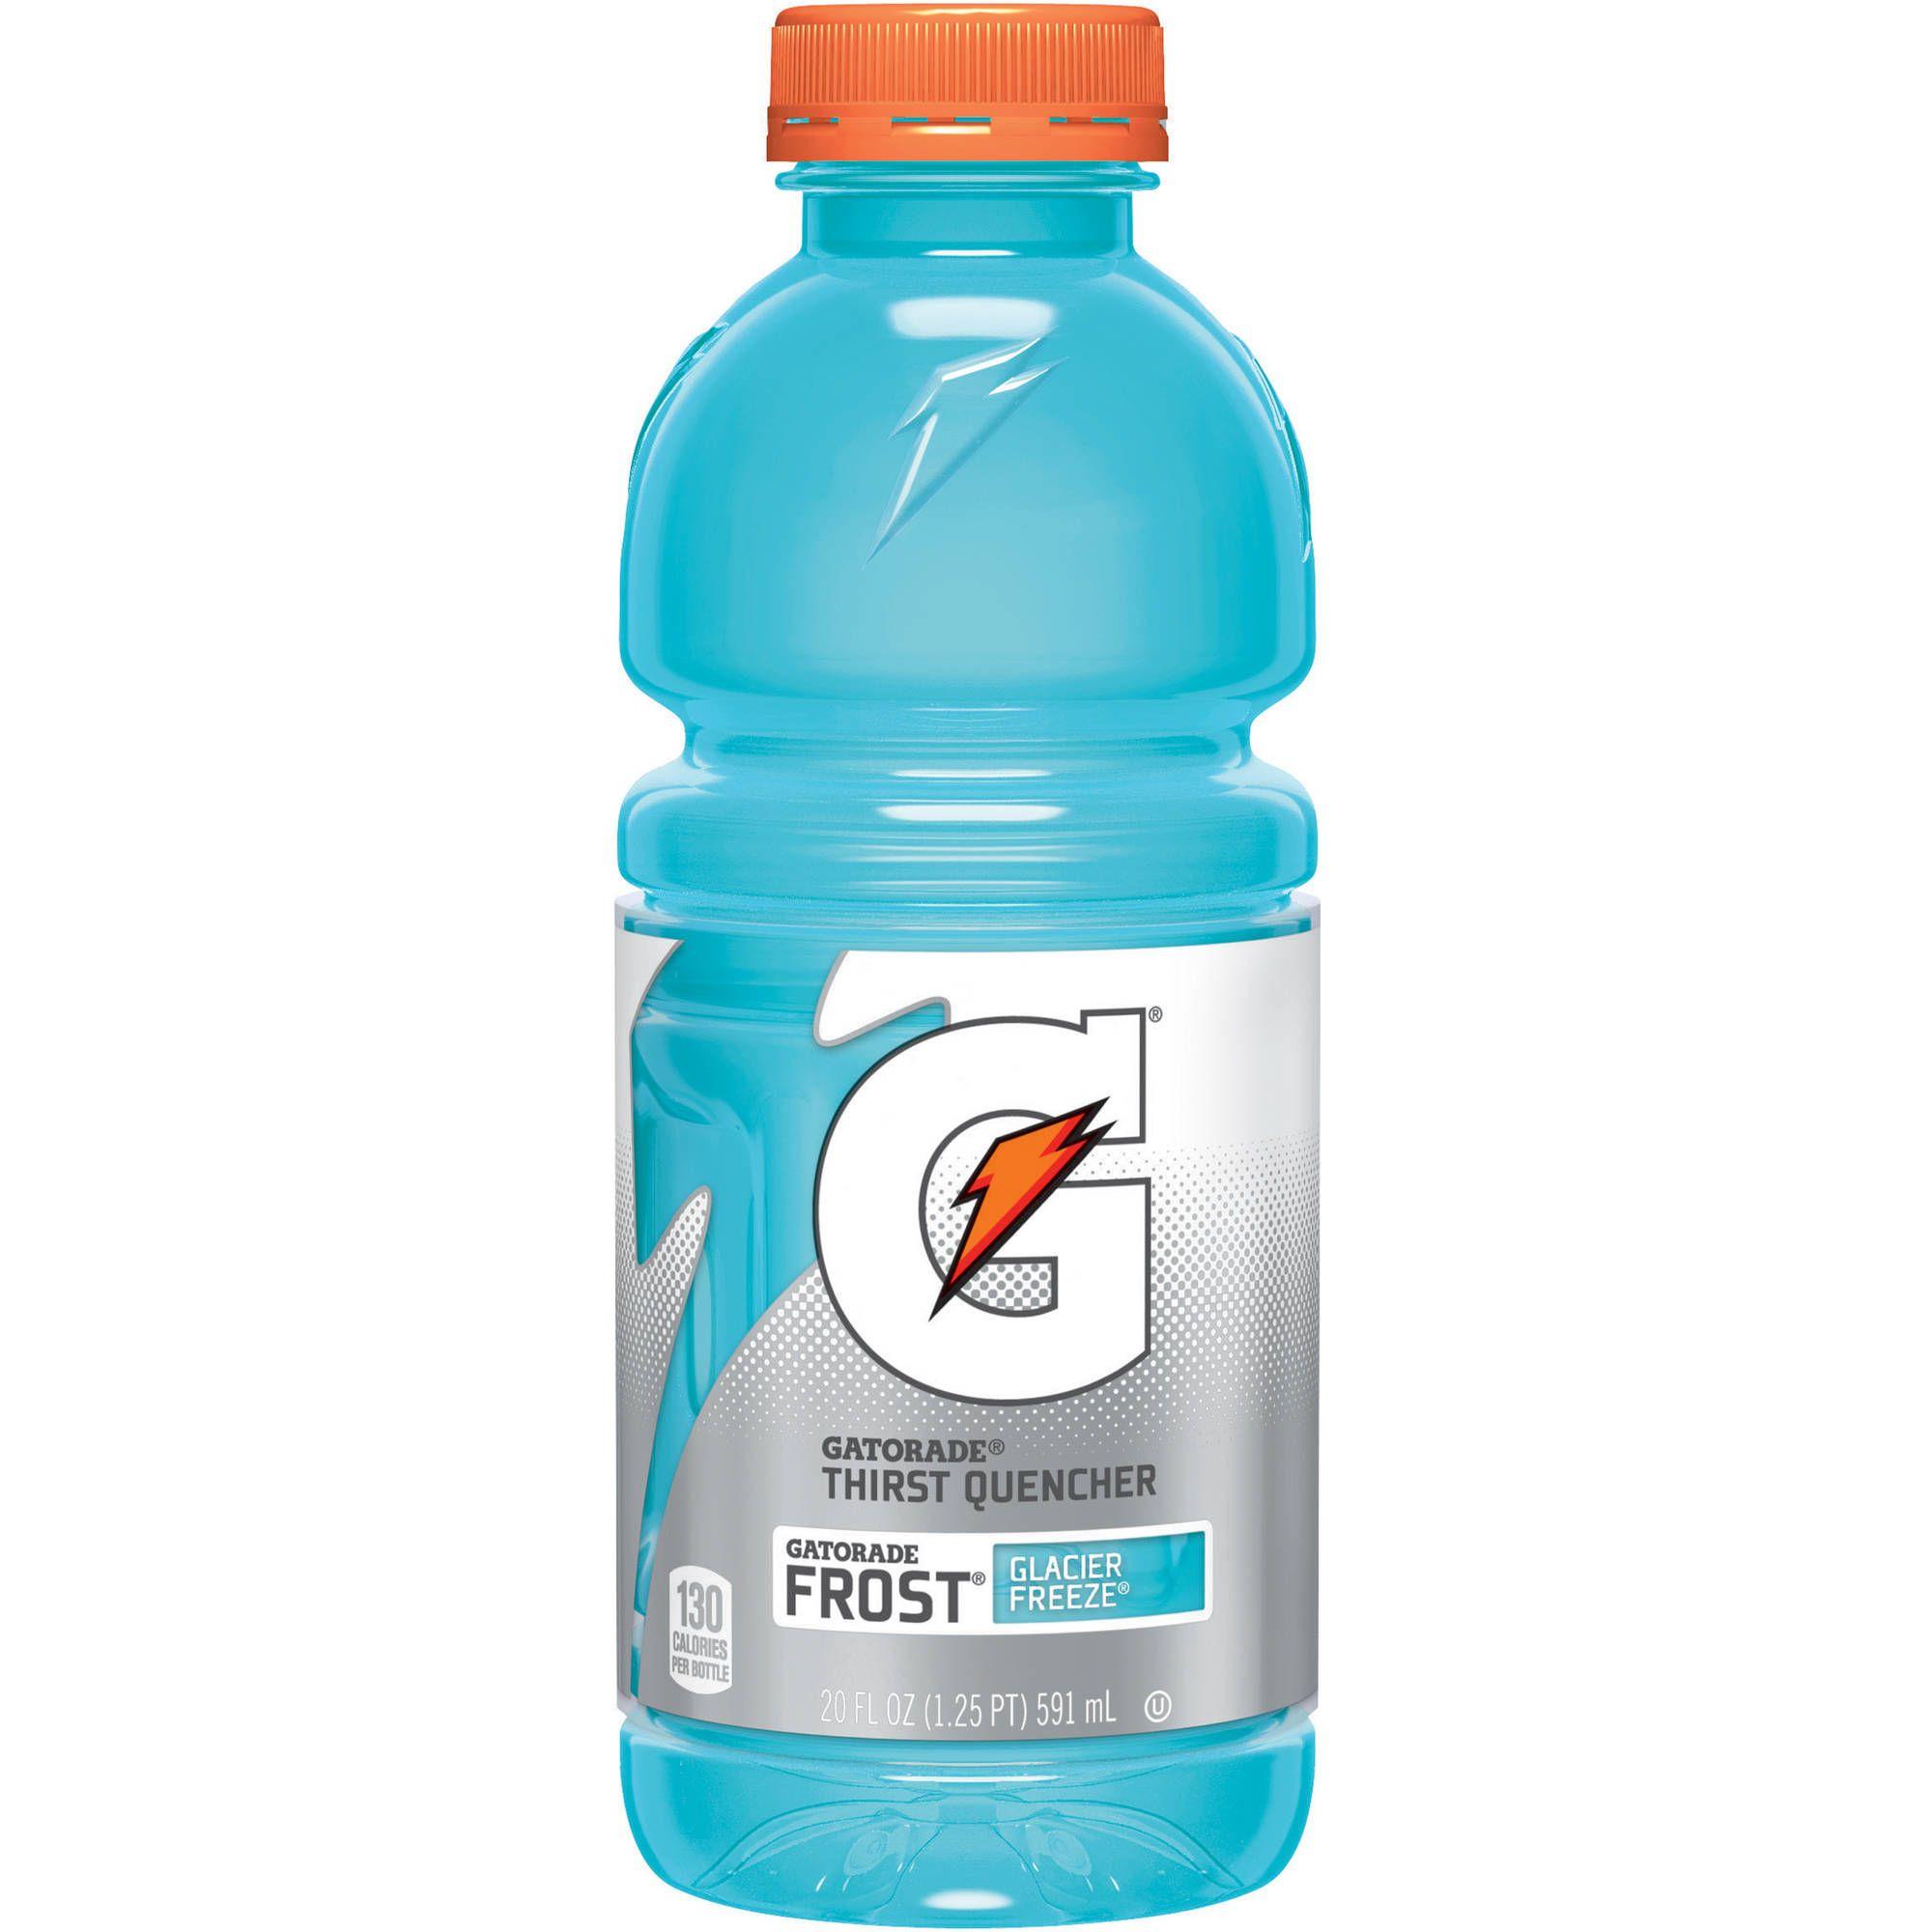 Gatorade Thirst Quencher Glacier Freeze Sports Drink 20 Fl Oz Walmart Com Gatorade Sports Drink Drinks